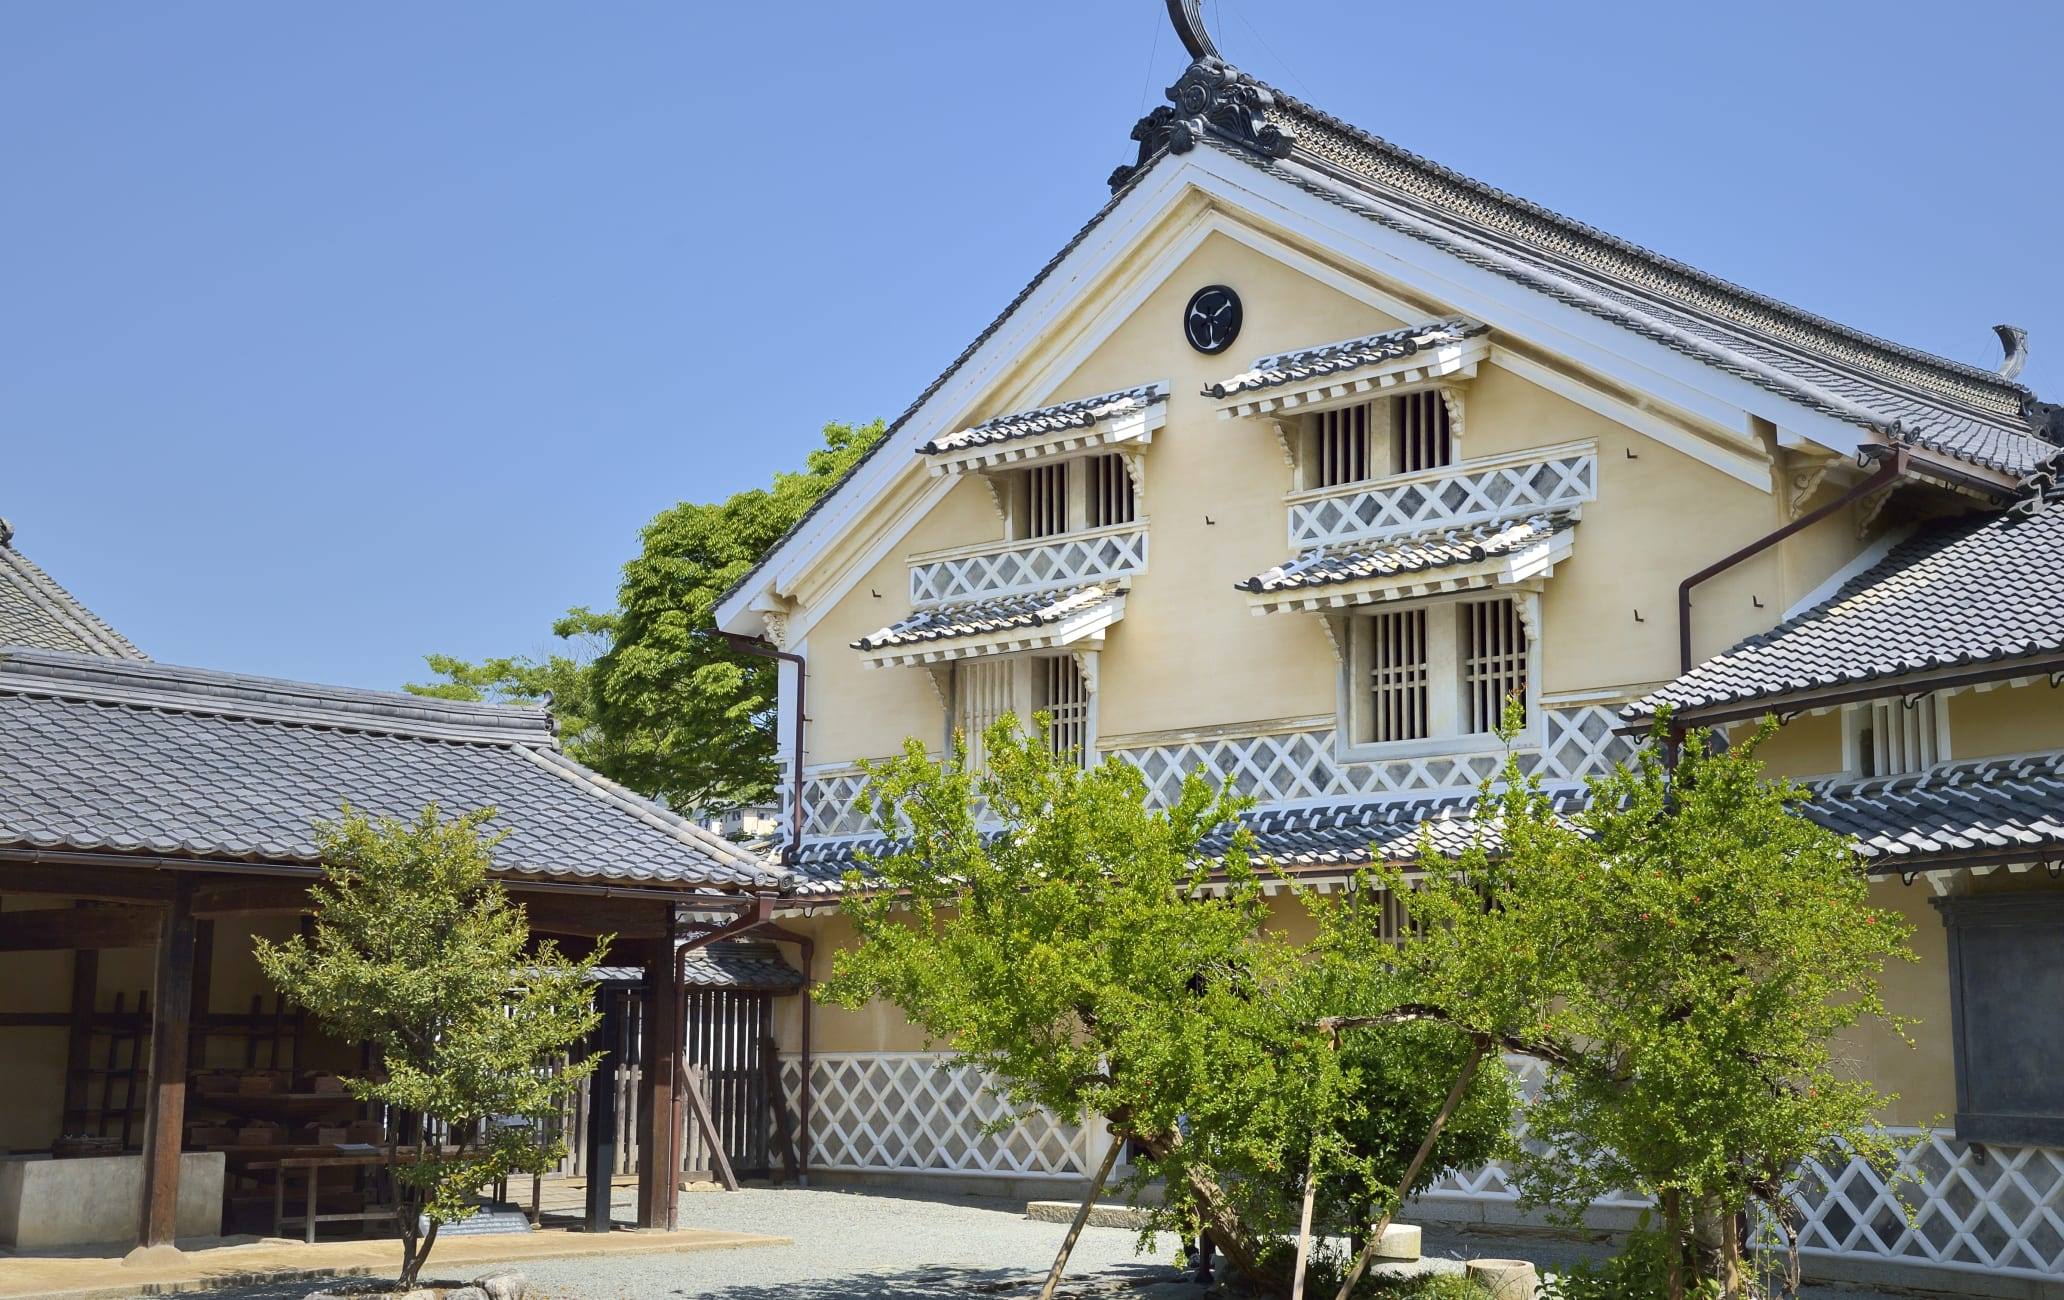 Yokaichi Old Town